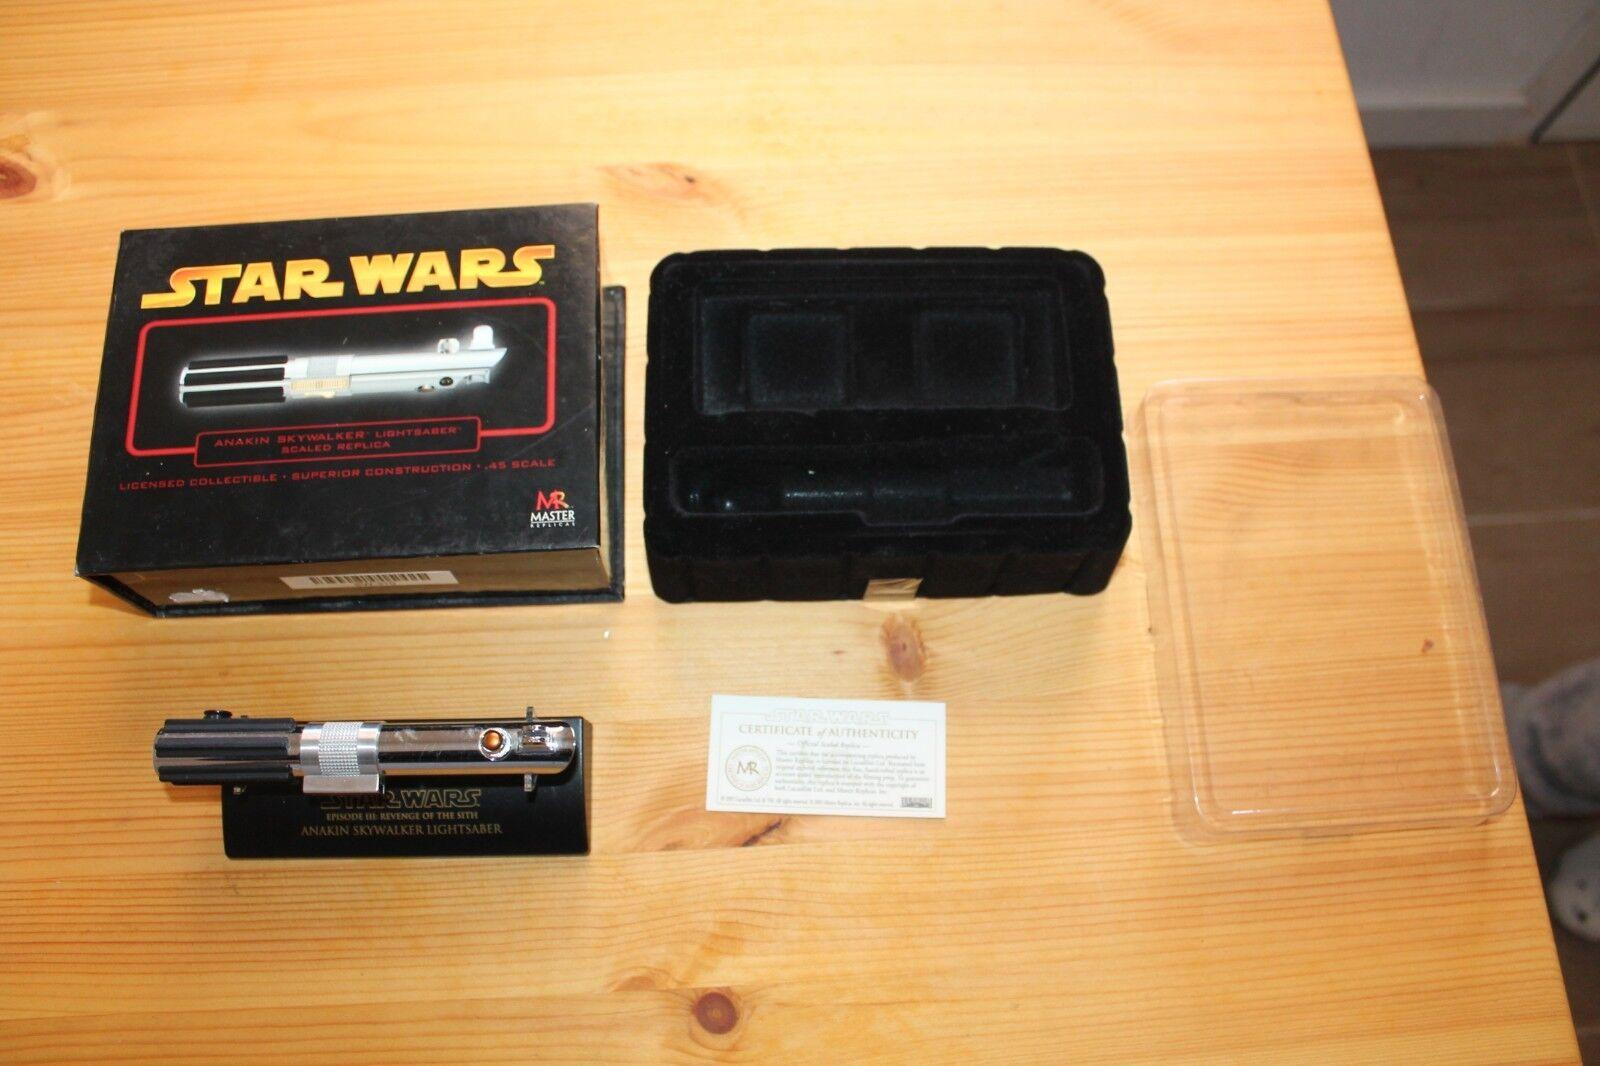 Anakin Skywalker Skywalker Skywalker Lightsaber Replica Escala 45 en caja Completo Master Replicas 2ce83b